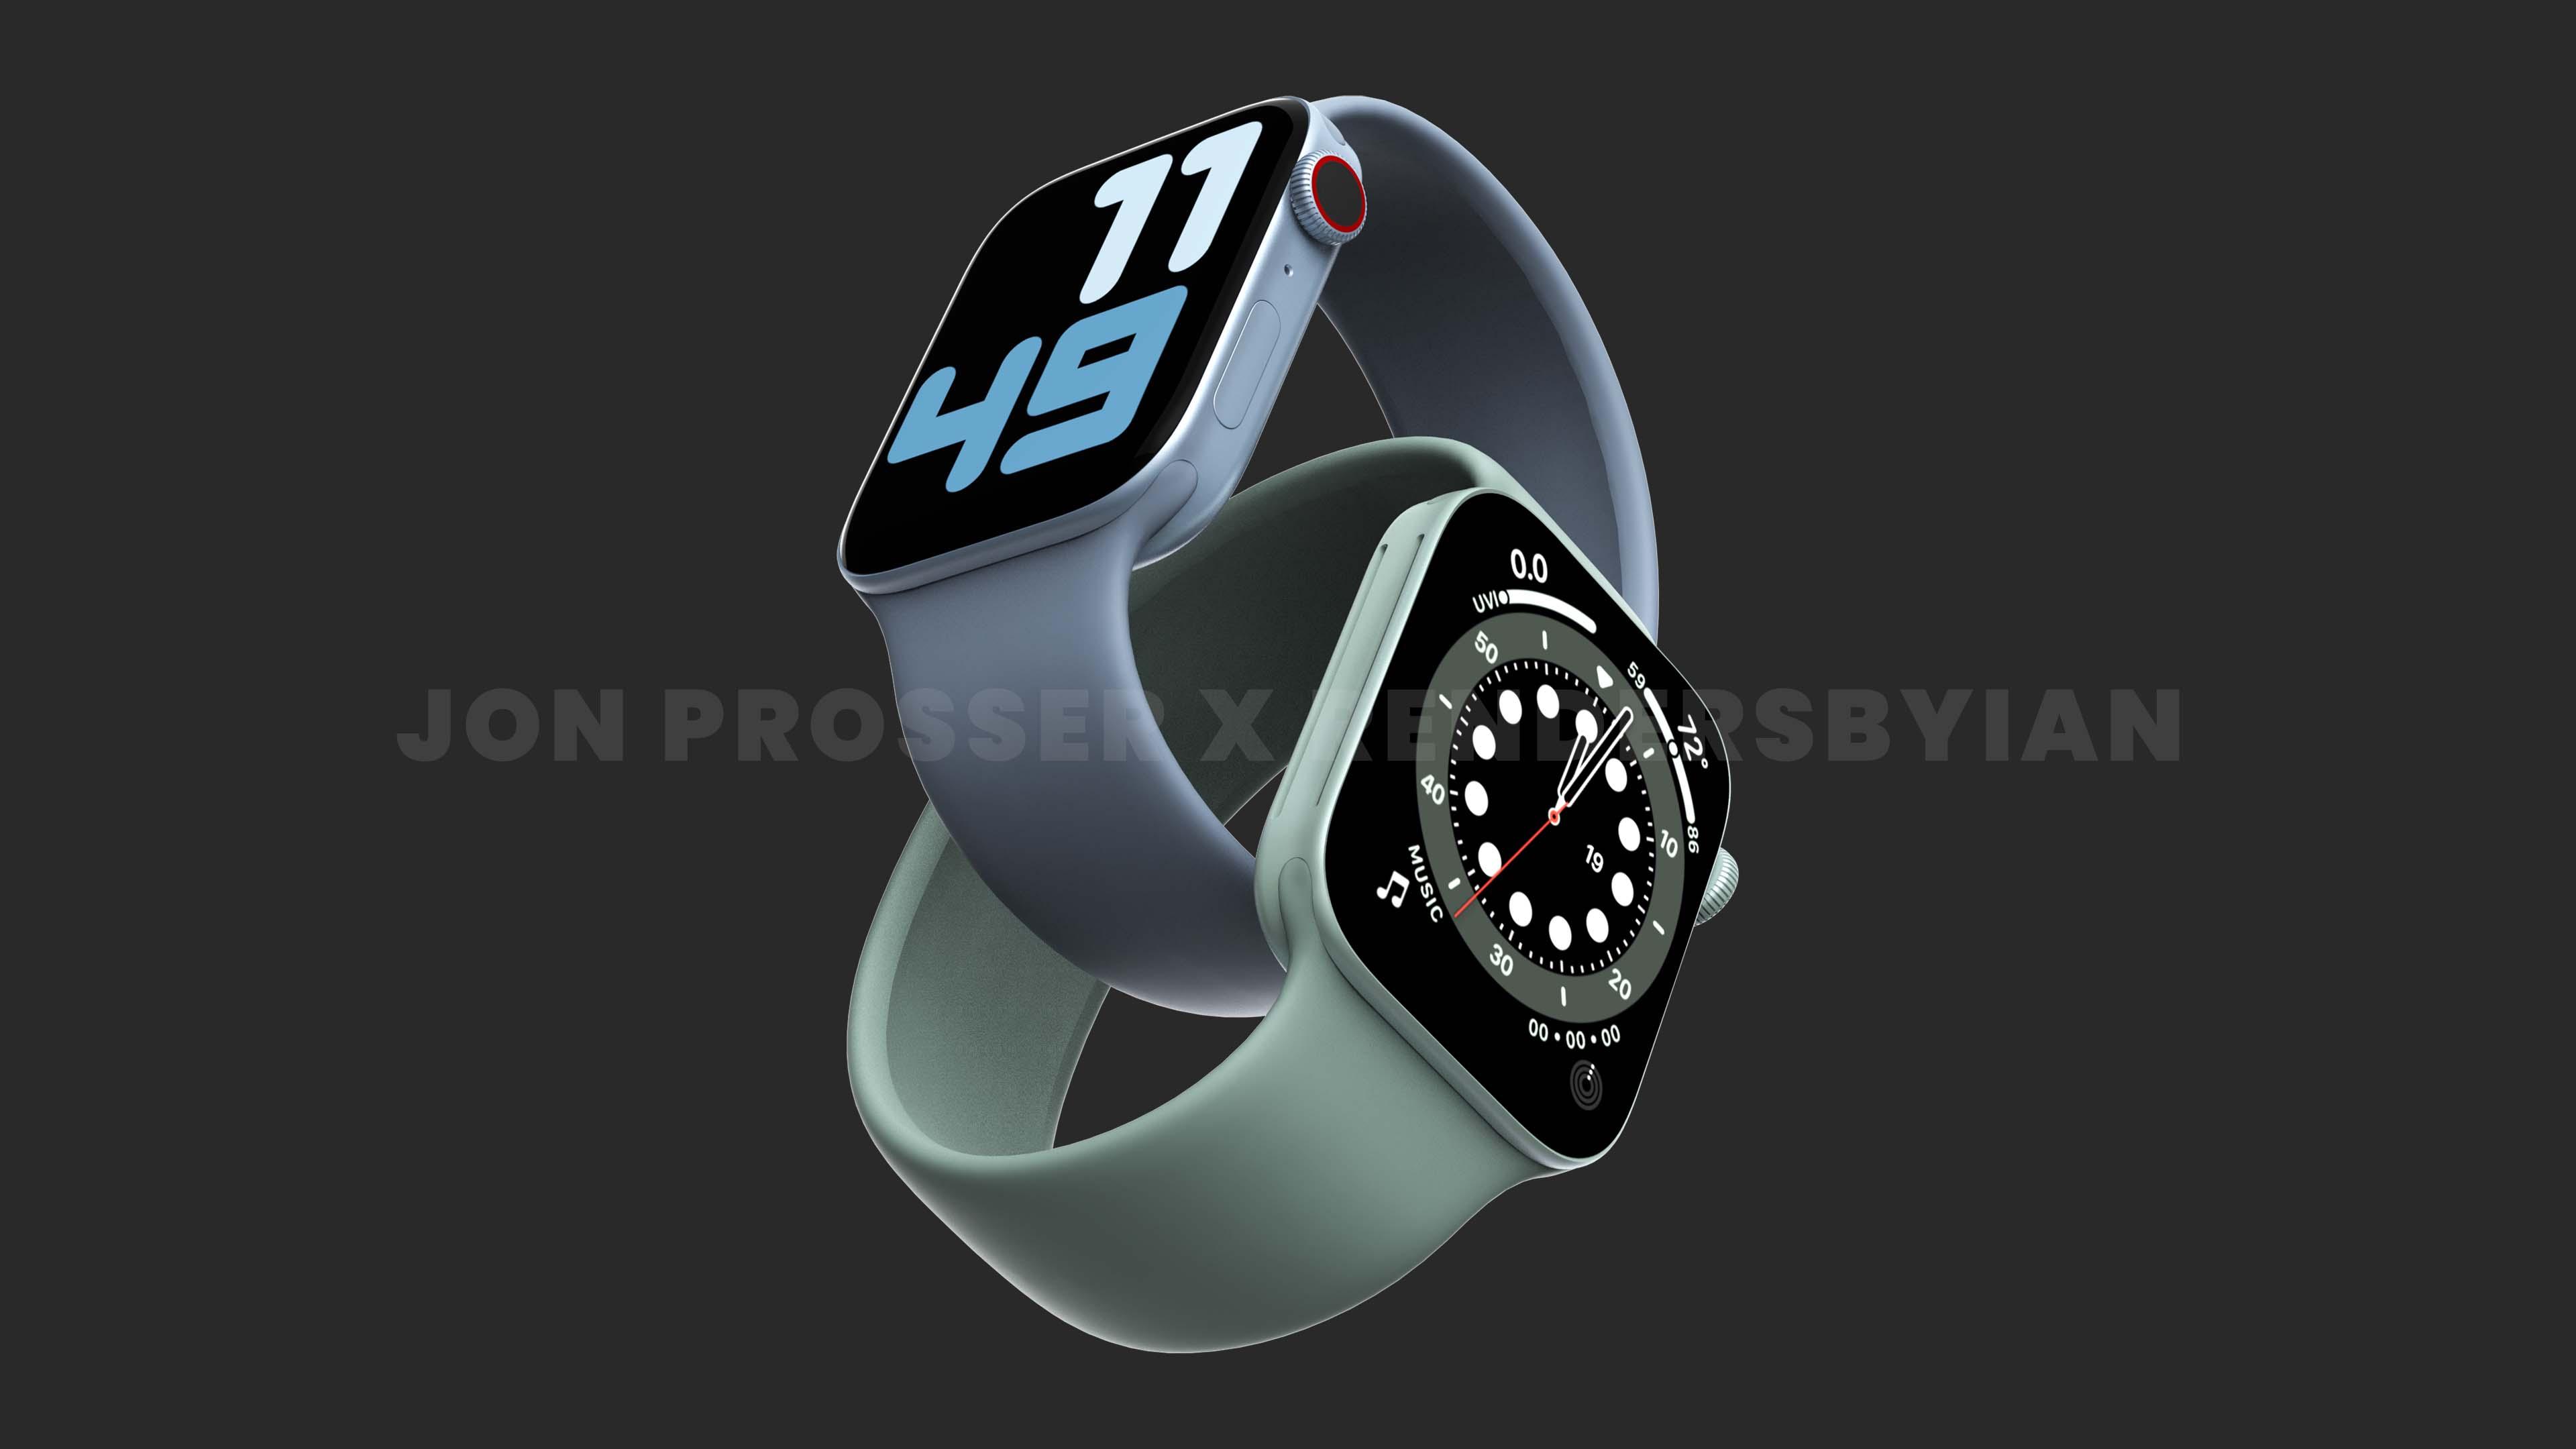 「Apple Watch Series 7」は大型ディスプレイを生かした新しい文字盤を搭載